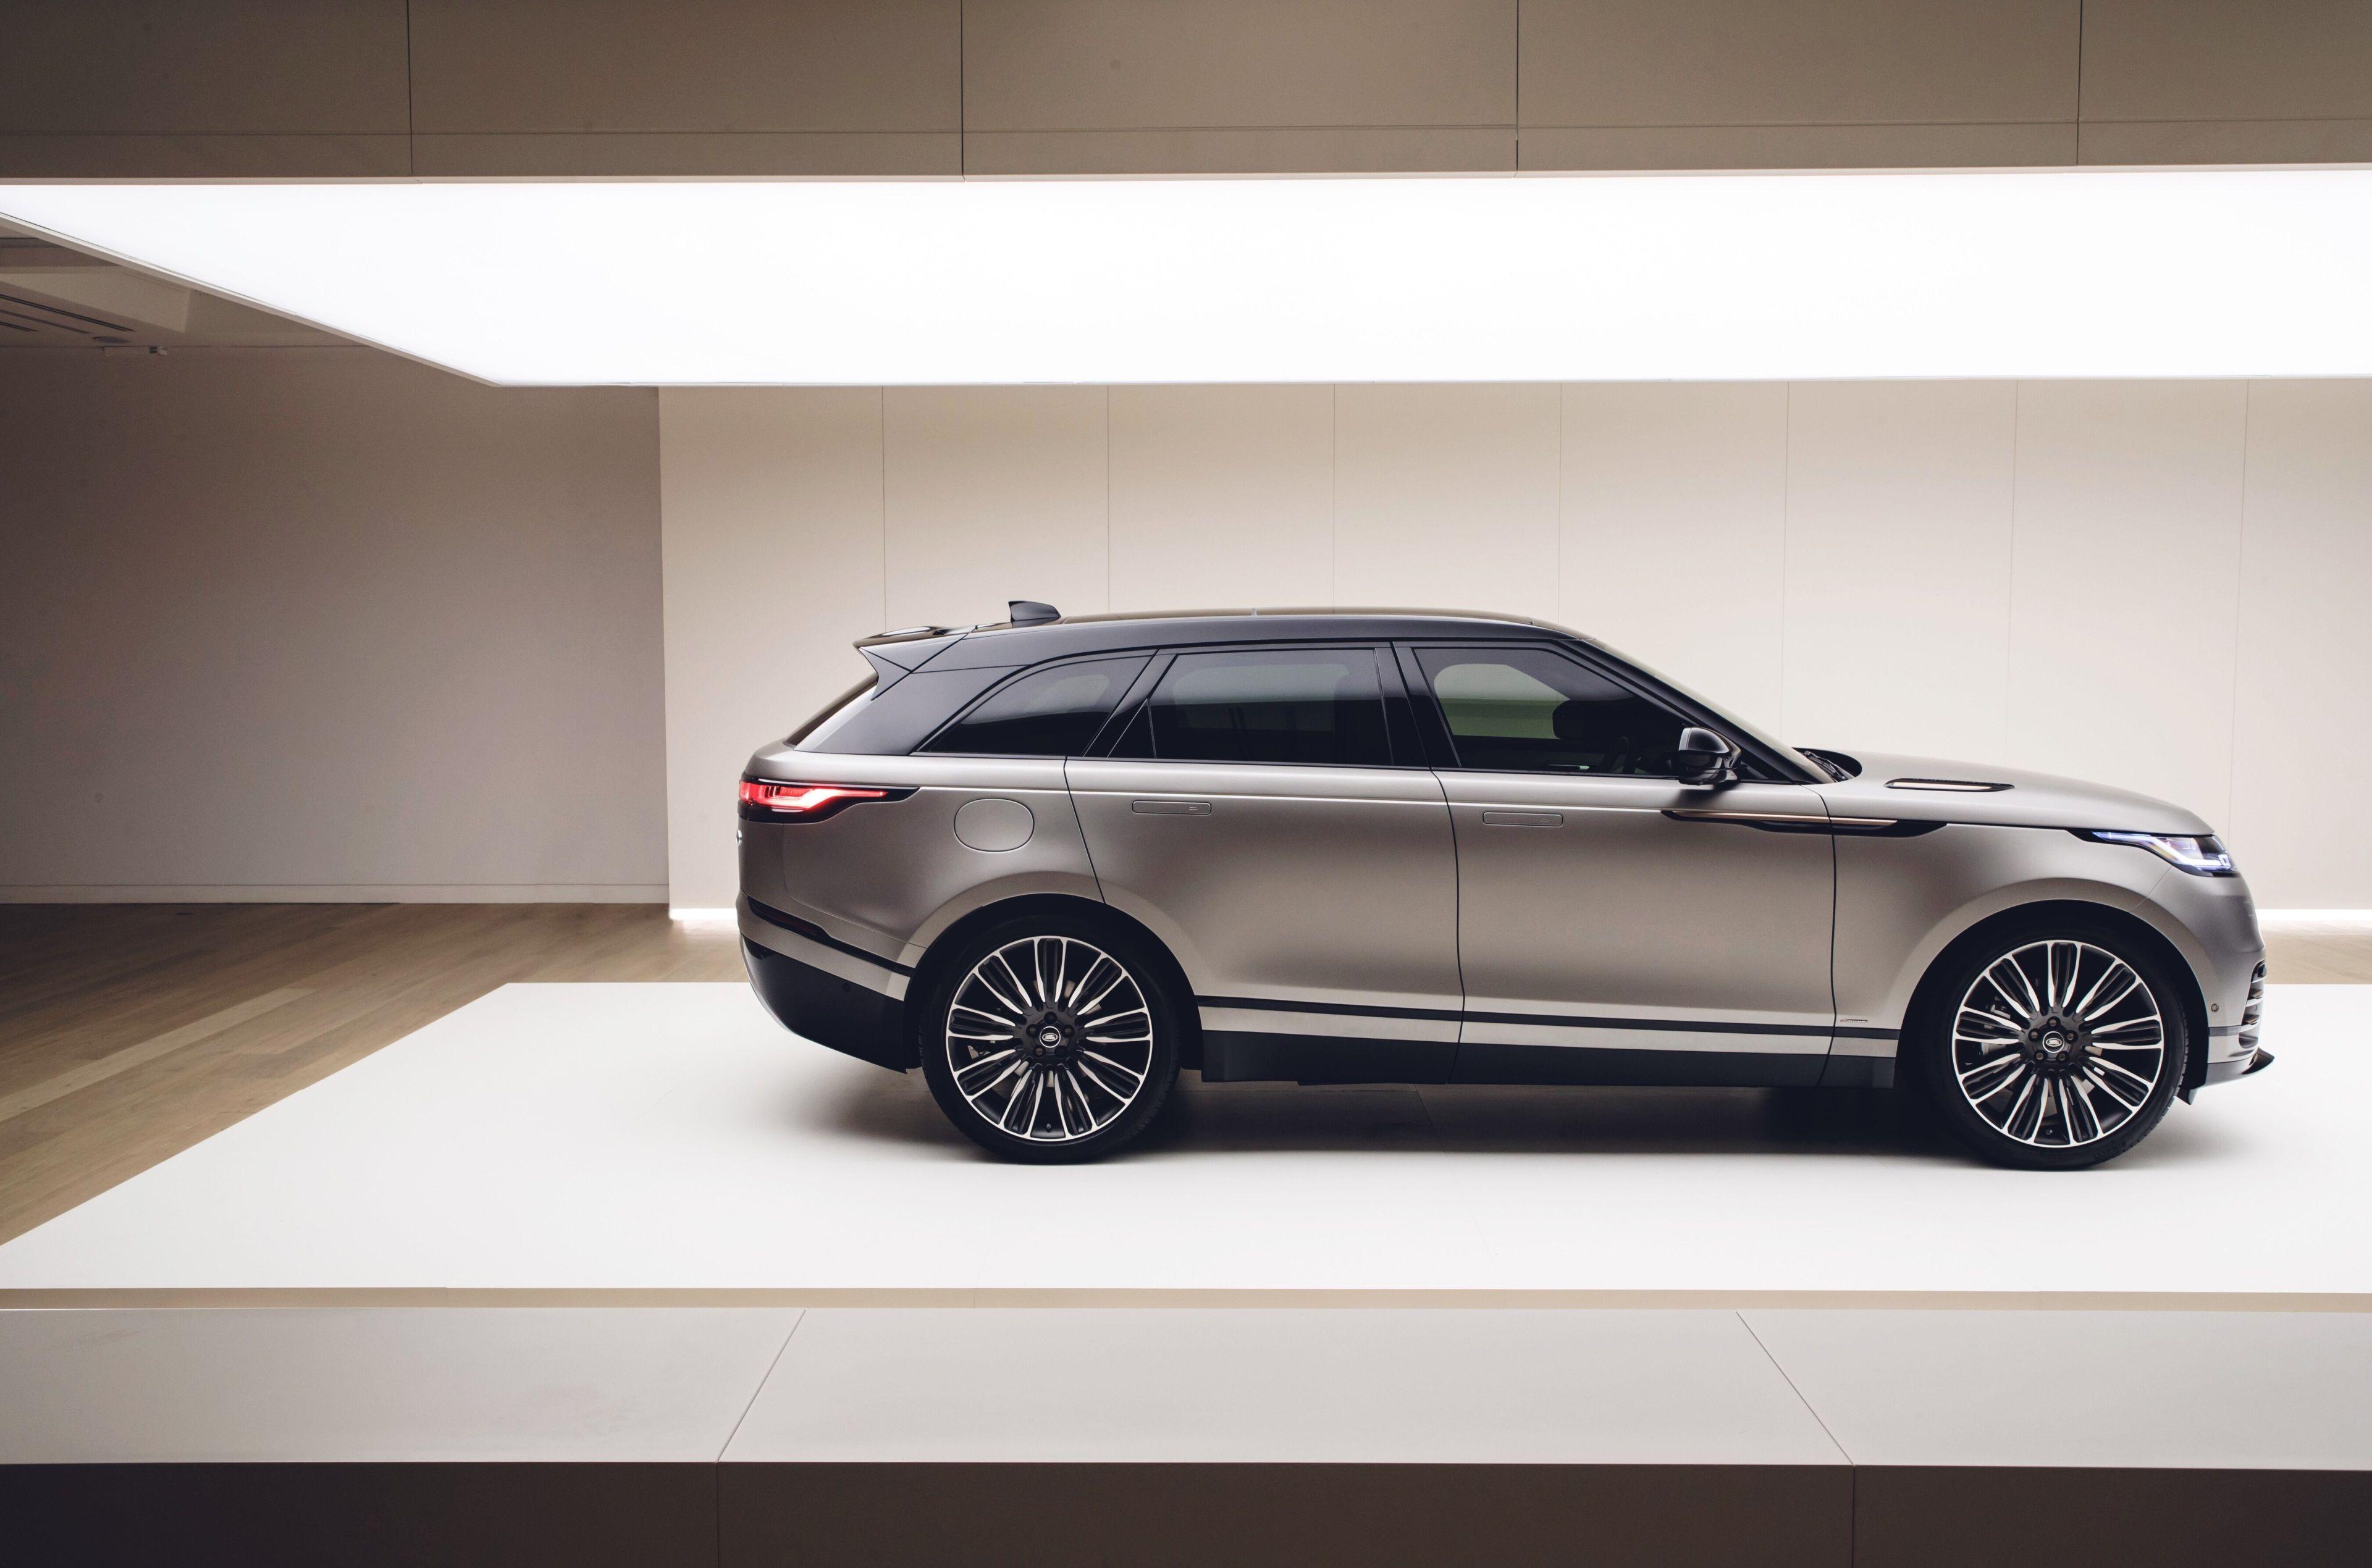 3840x2539 Range Rover Velar 4k Best Wallpapers Hd For Desktop Auto Carros Garagem